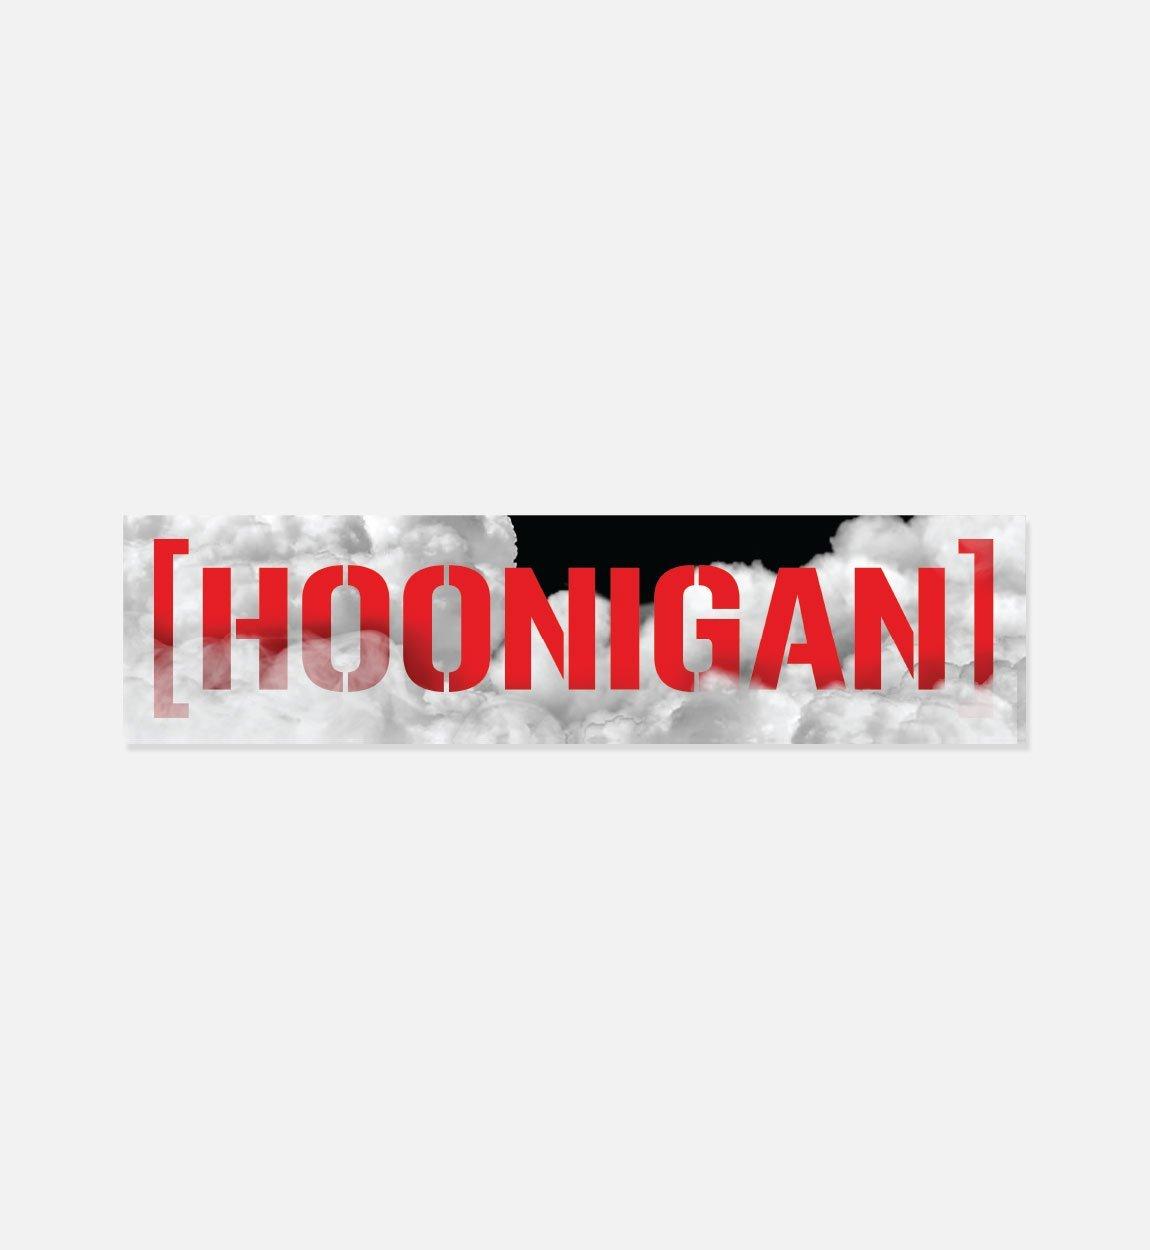 Hoonigan burn out censor bar premium vinyl sticker 8 die cut vinyl decal customize your laptop notebook skateboard luggage car truck bumper